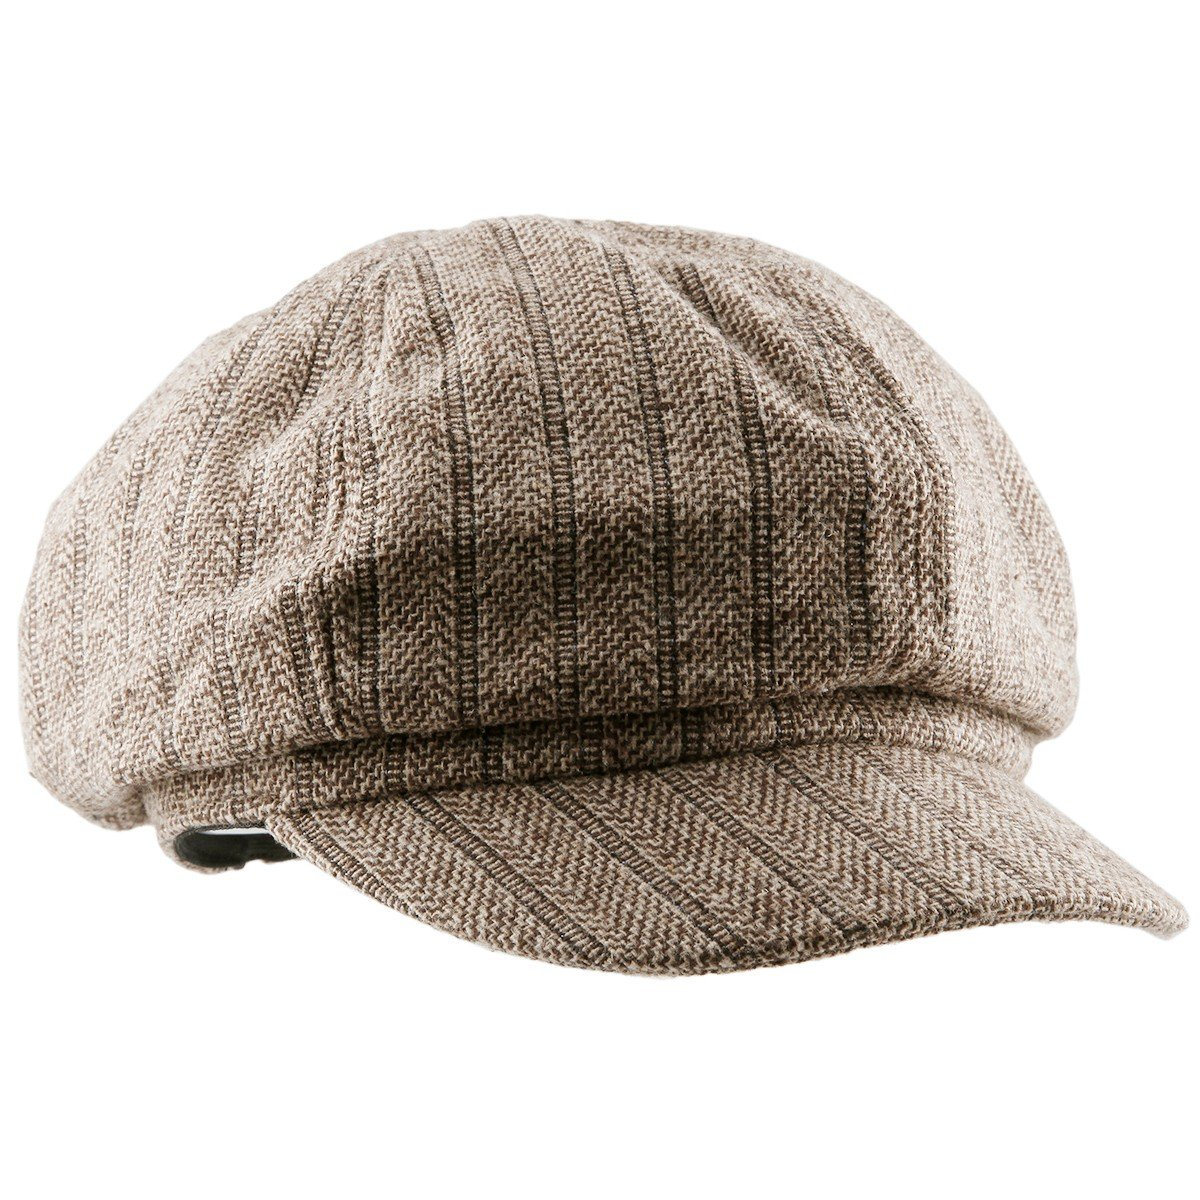 Moonsix Newsboys Hats,Unisex Winter Berets Hat Woolen Cotton Cabbie Cap 1